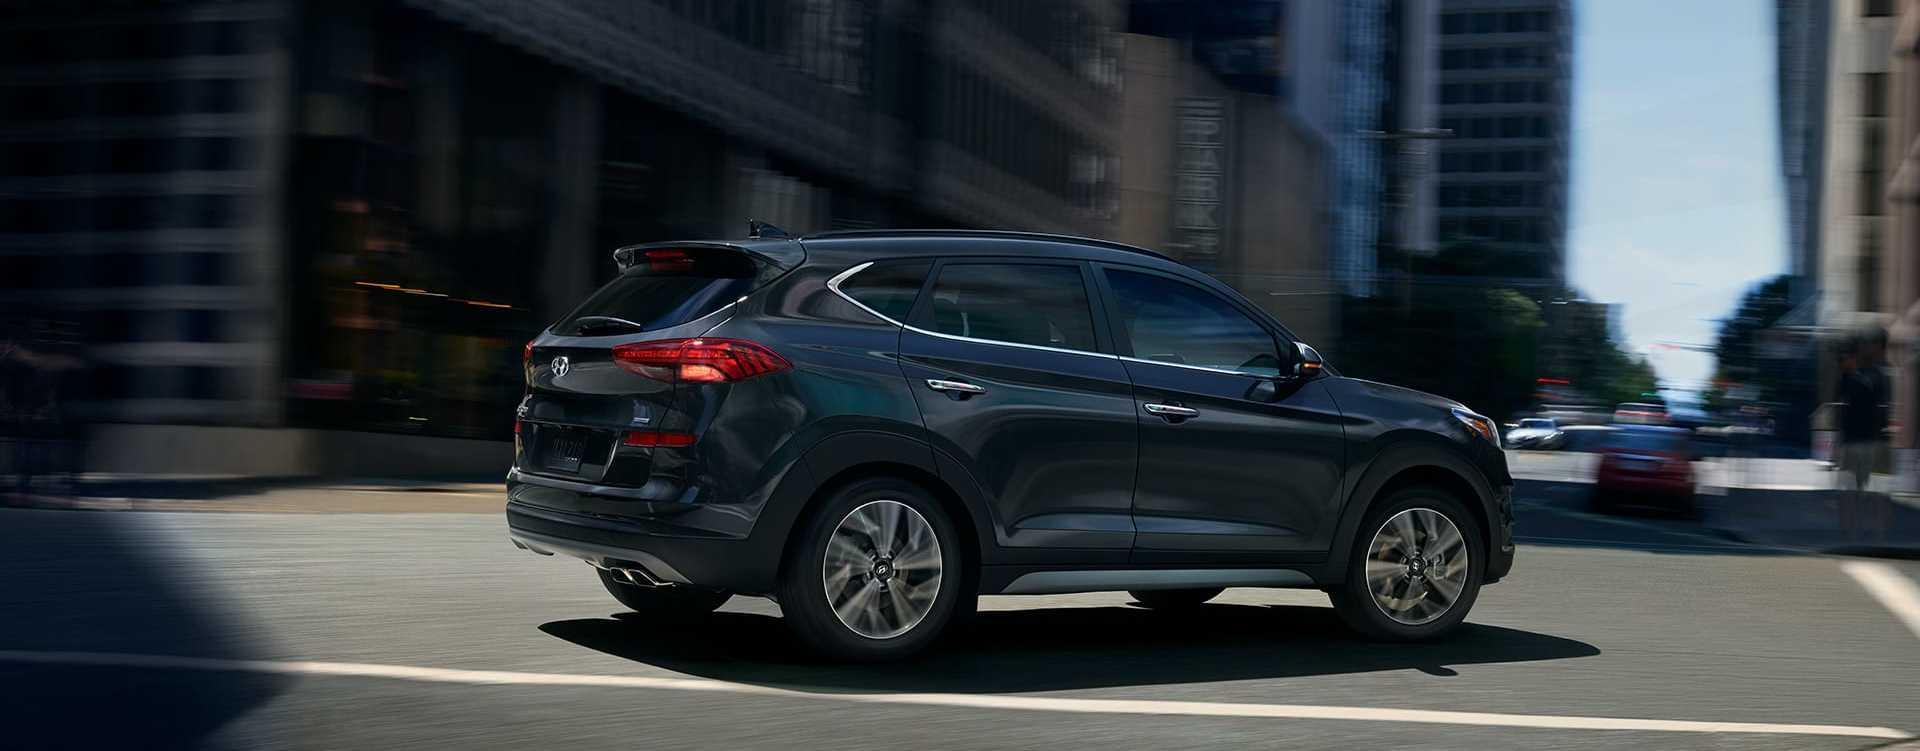 2020 Hyundai Tucson Leasing near Alexandria, VA